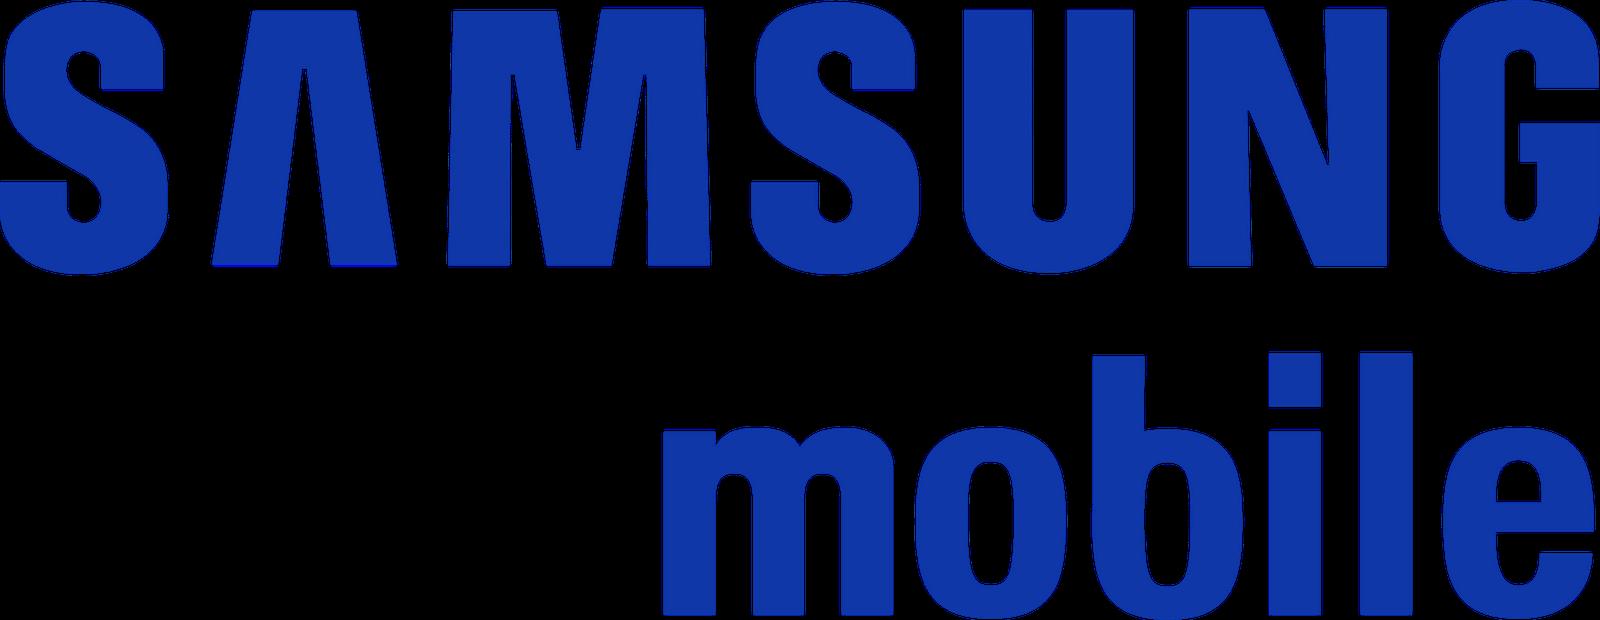 Gt S5610 Service Manualrar Instrukcje Serwisowe Samsung Sgh G810 Manual